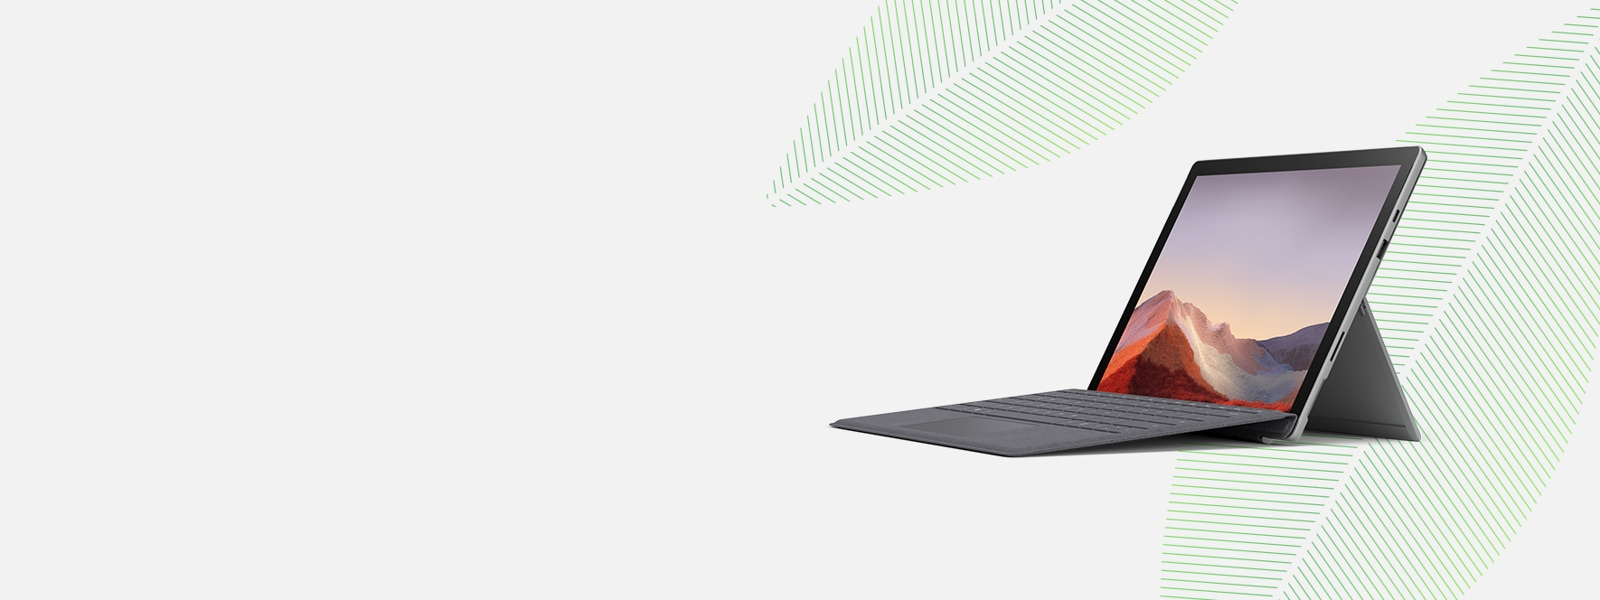 A Surface Pro 7